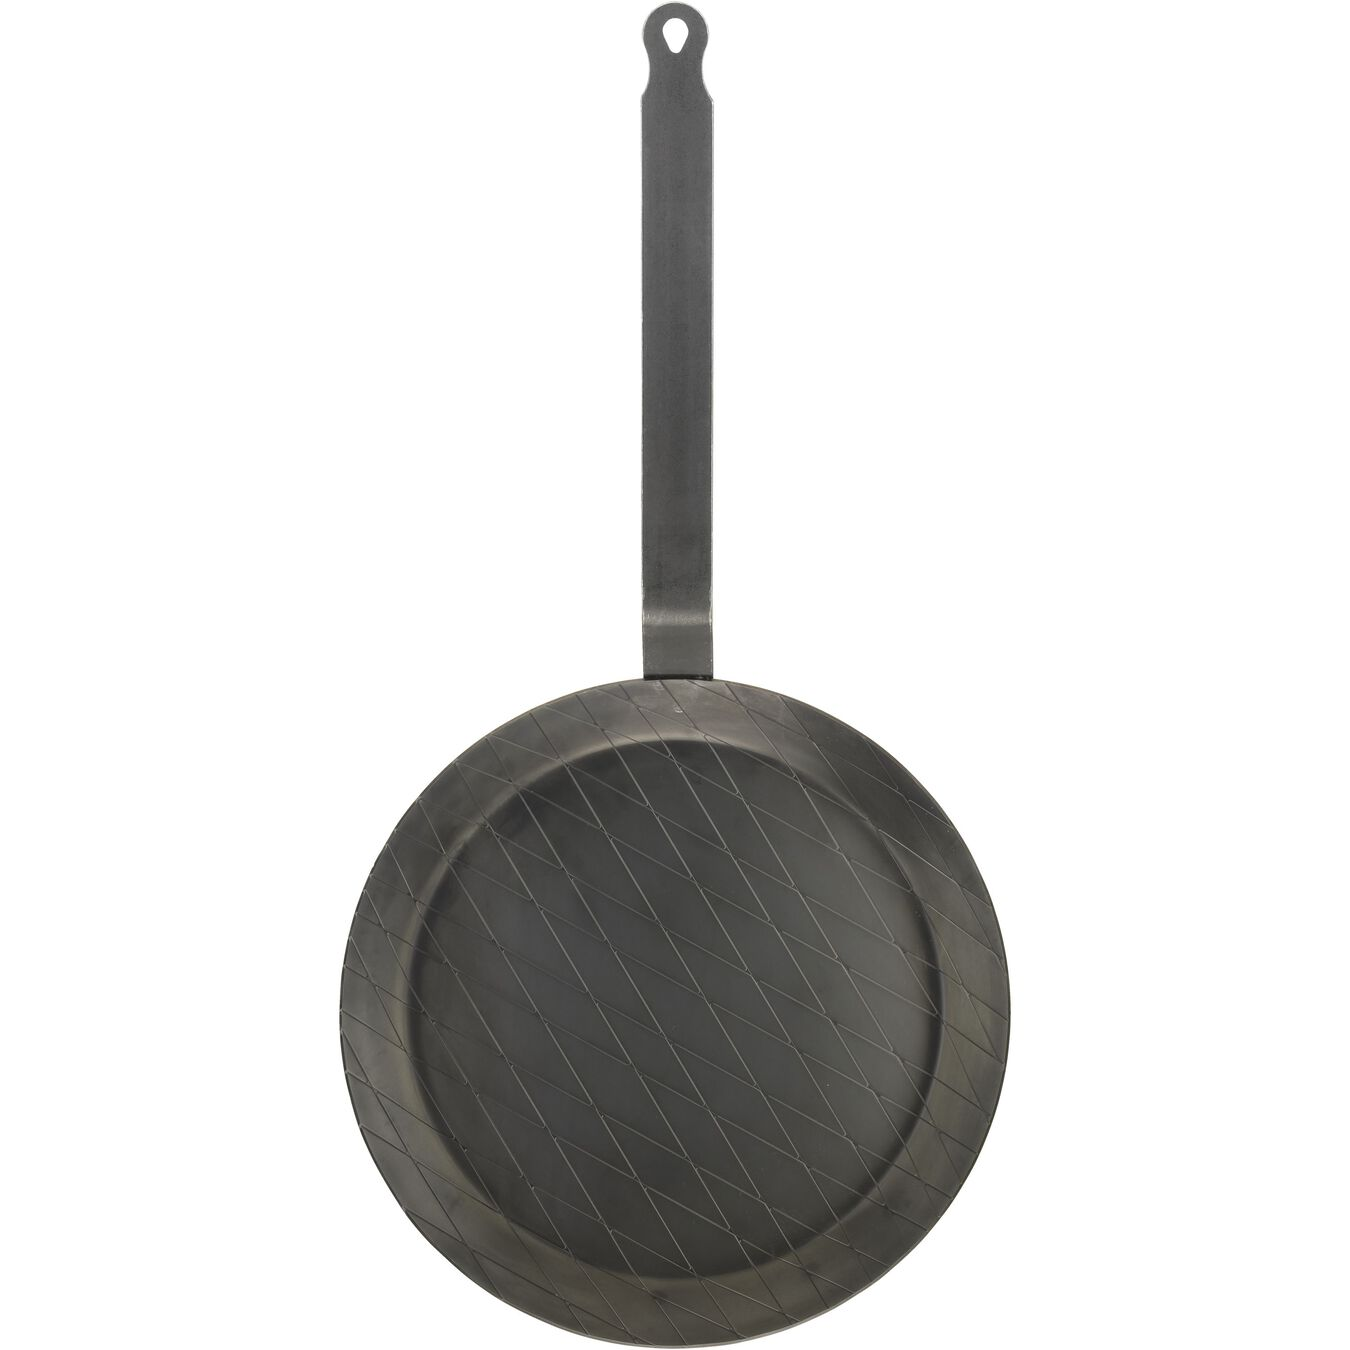 28 cm / 11 inch Frying pan,,large 2